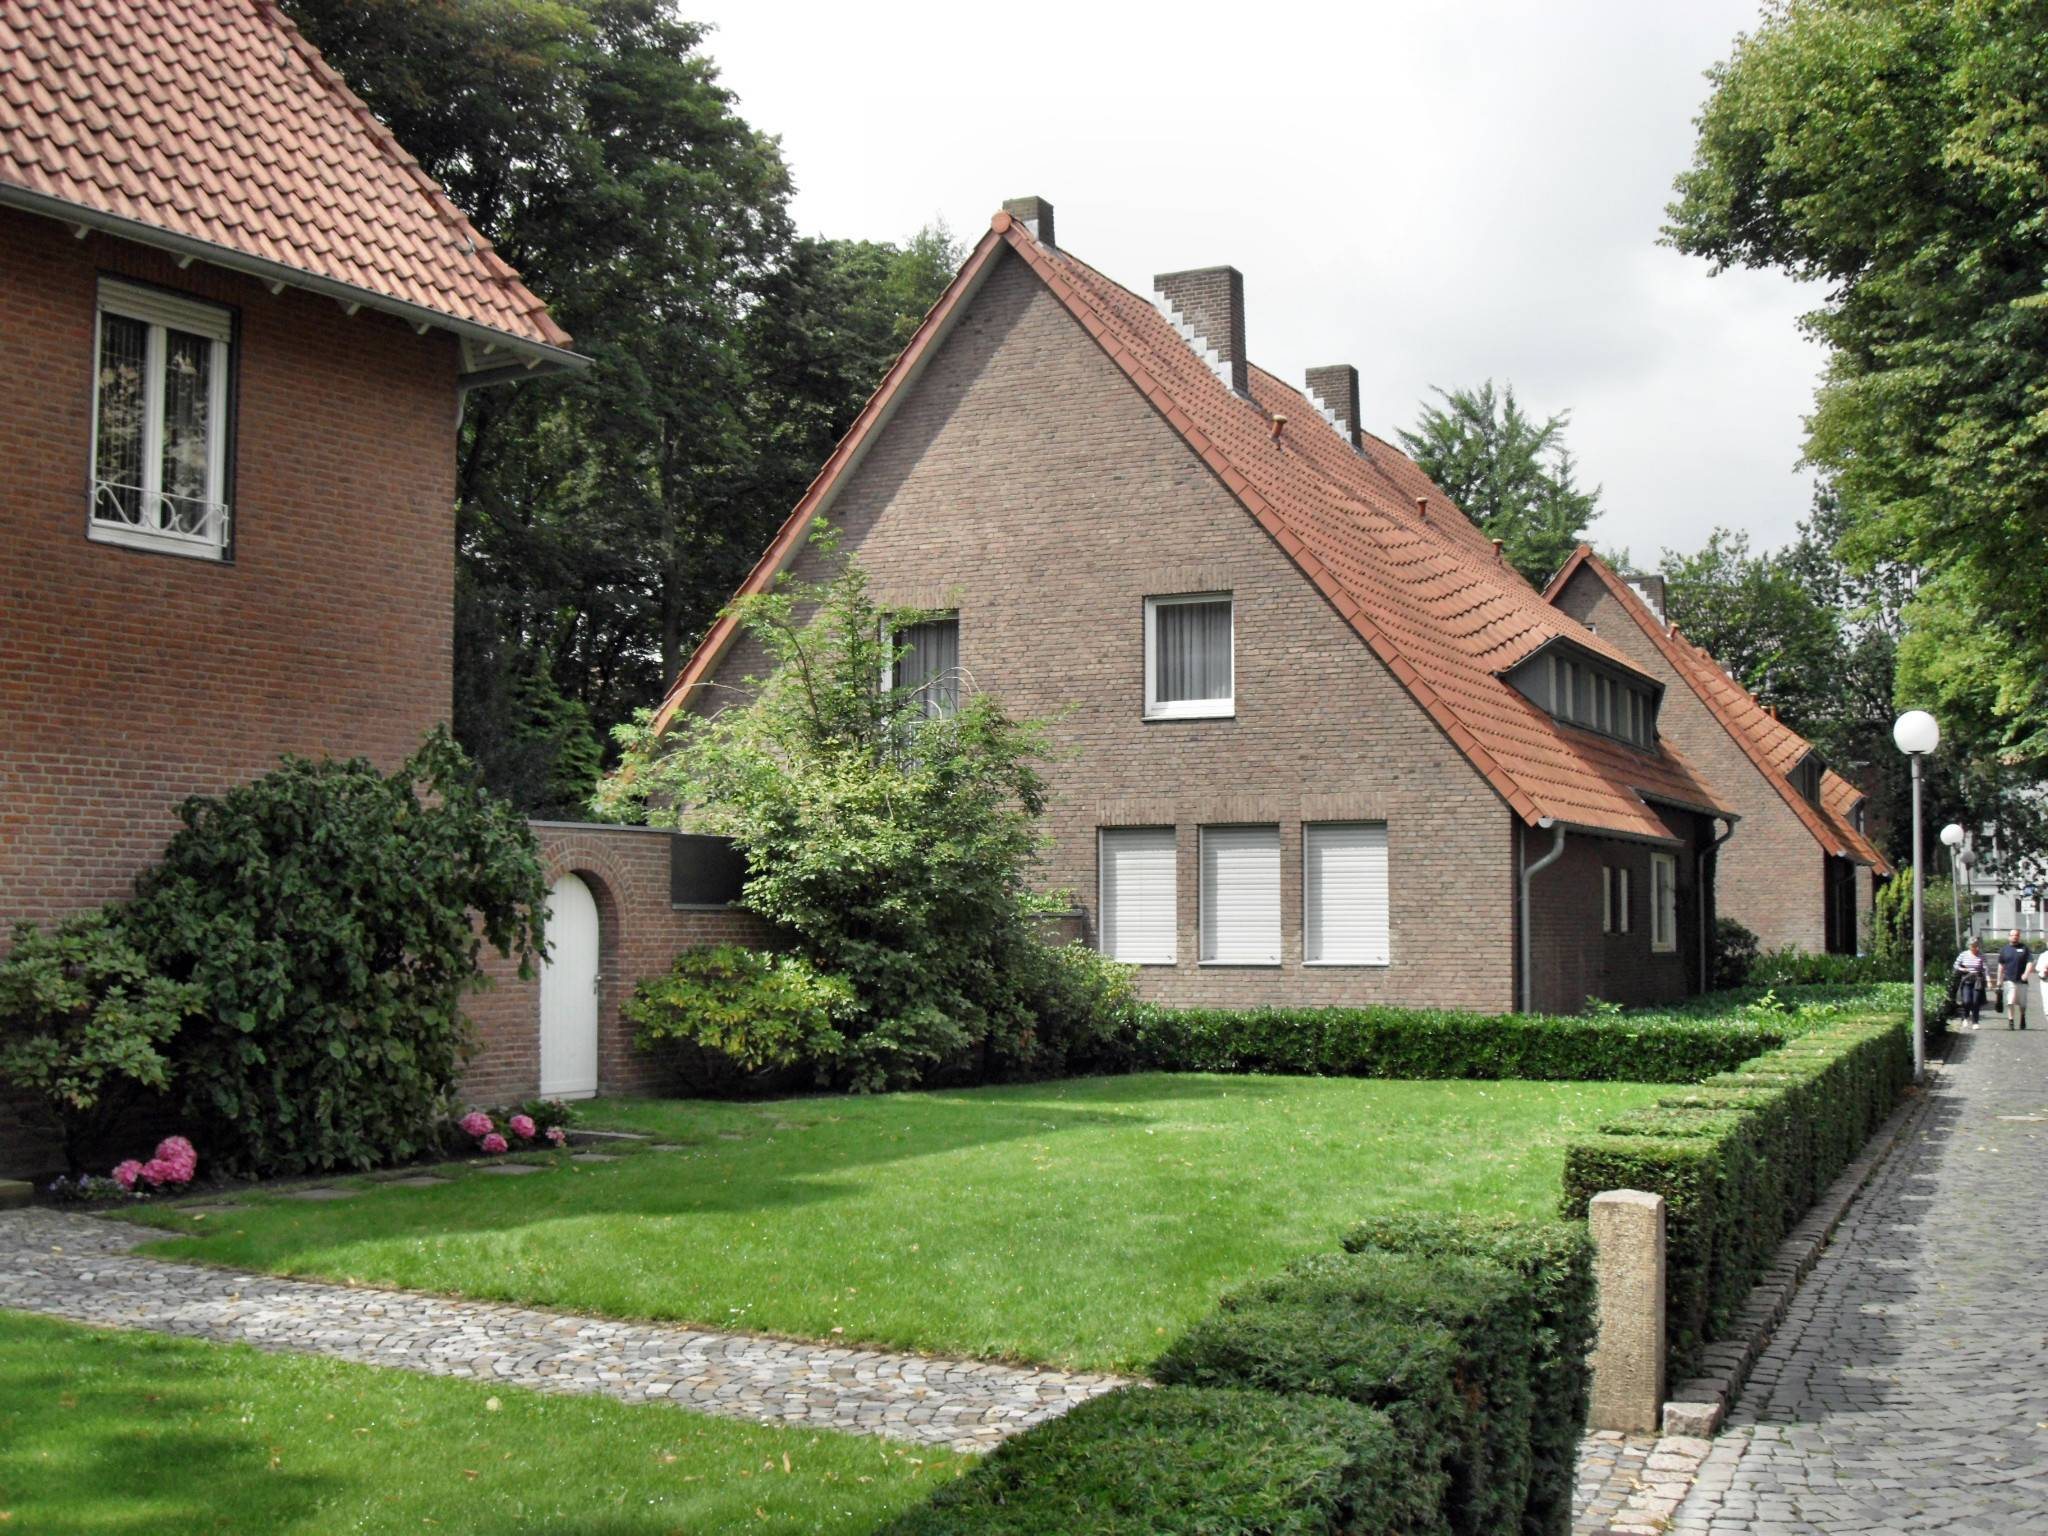 Дома в стране германия - 4908 предложений